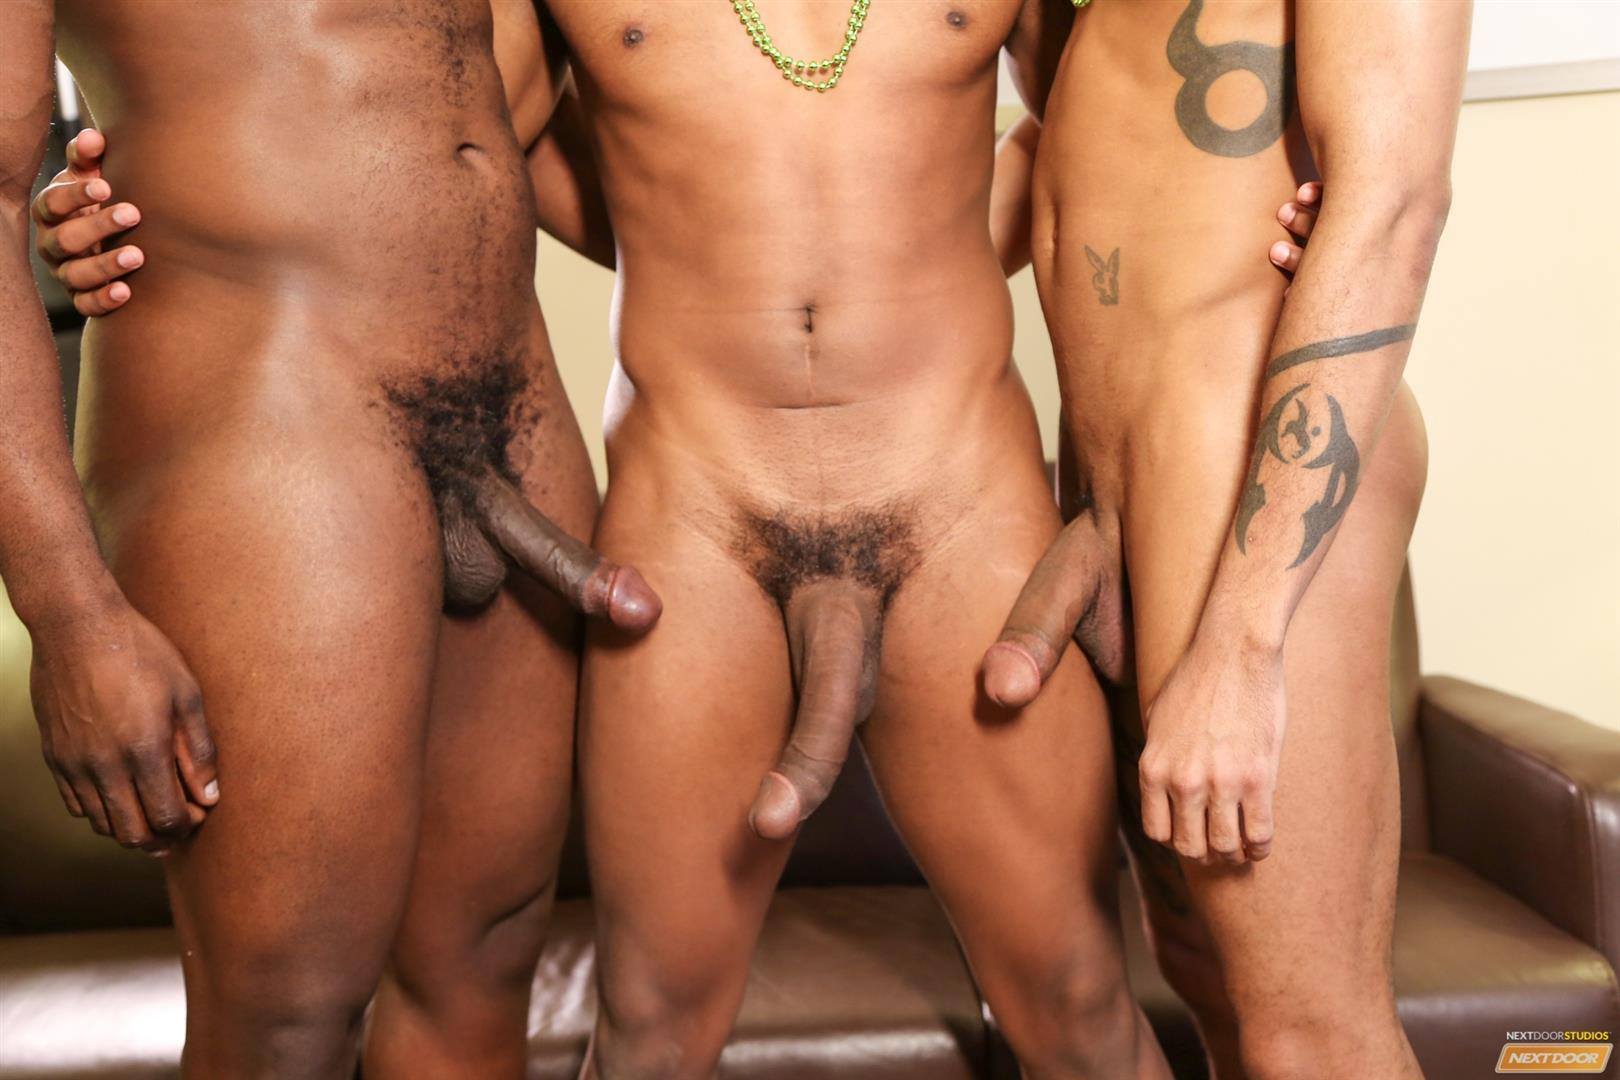 Next Door Ebony Nubius and Jin Powers and XL Naked Thugs Threeway Fucking Amateur Gay Porn 06 Big Black Cock Threeway Suck and Fuck Thug Fest